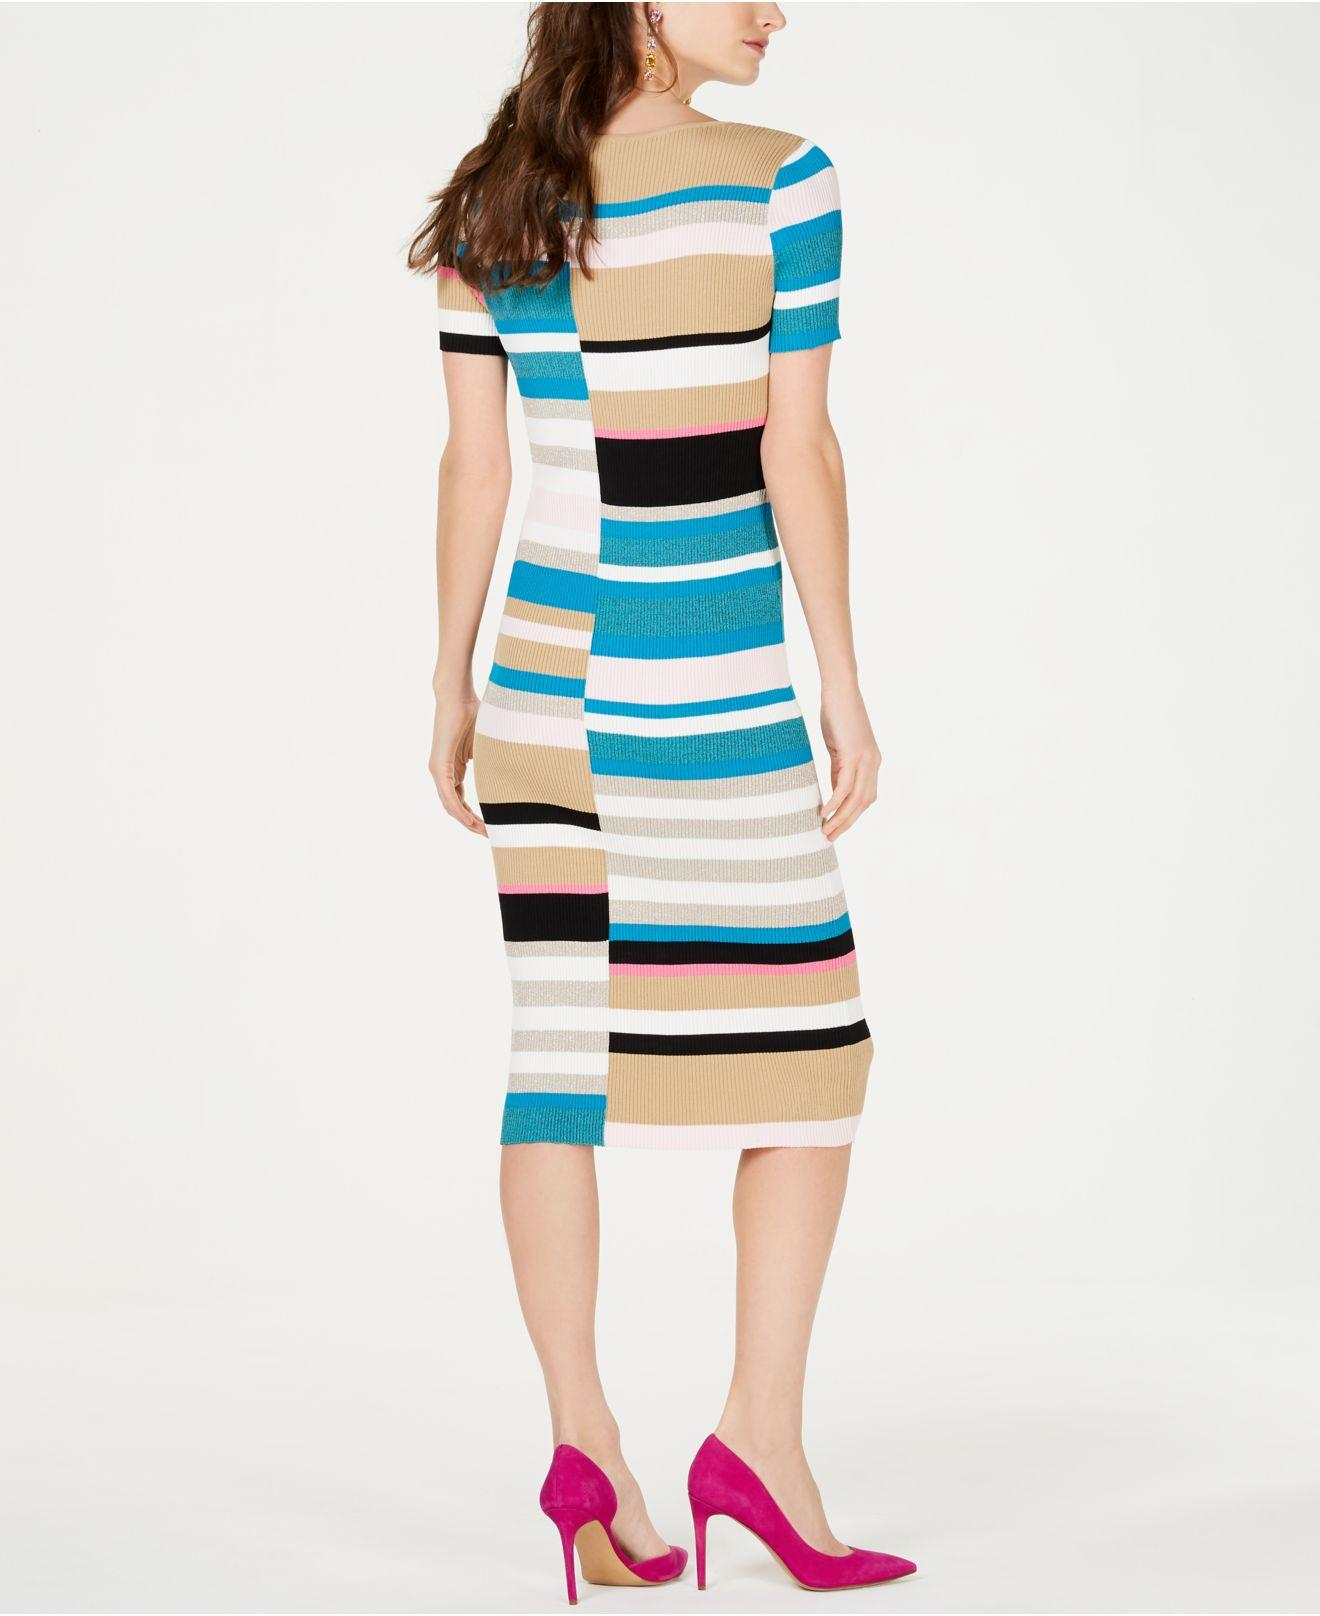 21f471b71a4 Lyst - INC International Concepts I.n.c. Petite Colorblocked Short-sleeve Sweater  Dress